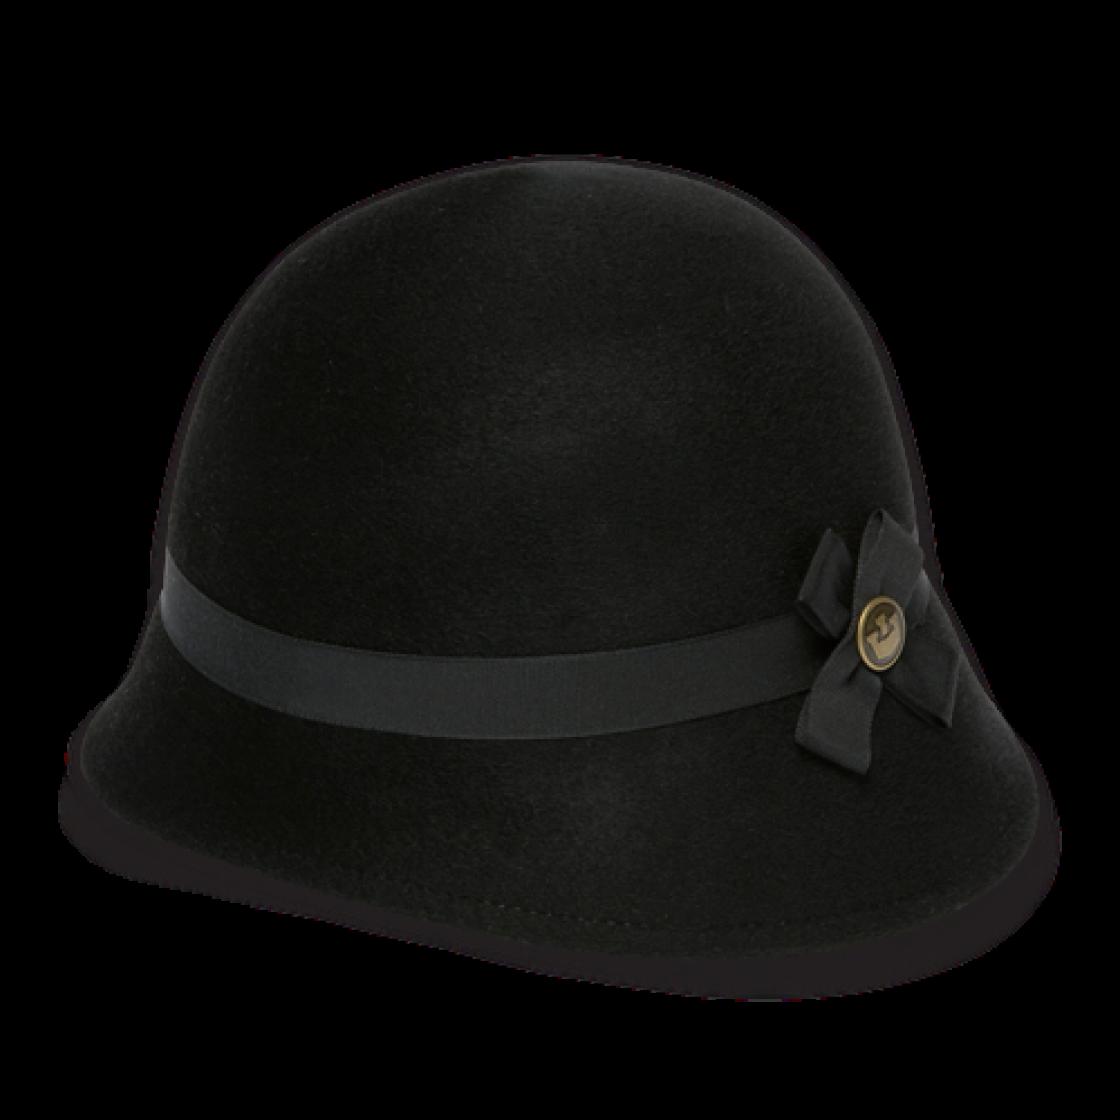 Potato clipart hat. Twenty seven isolated stock